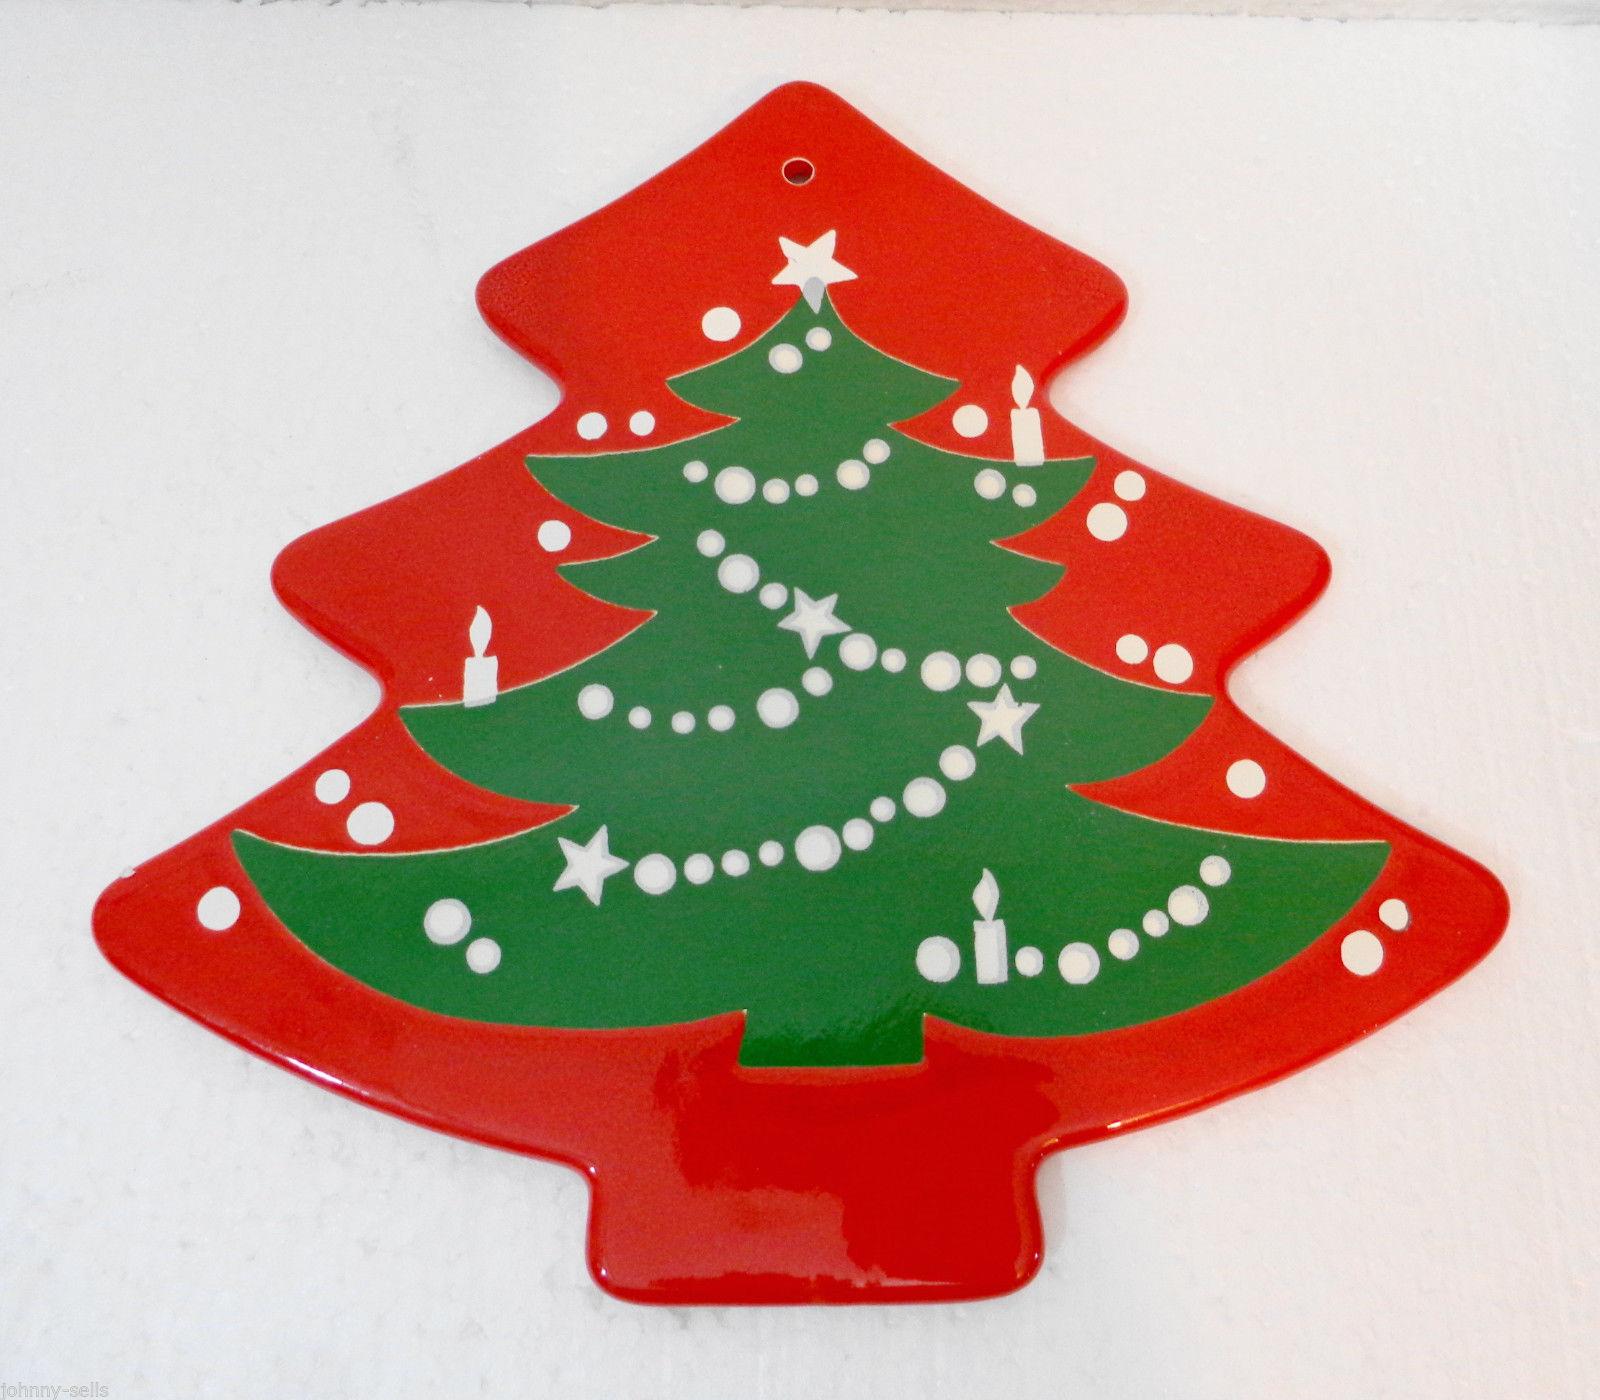 Waechtersbach Christmas Tree Shaped Trivet Wall Hanging ...